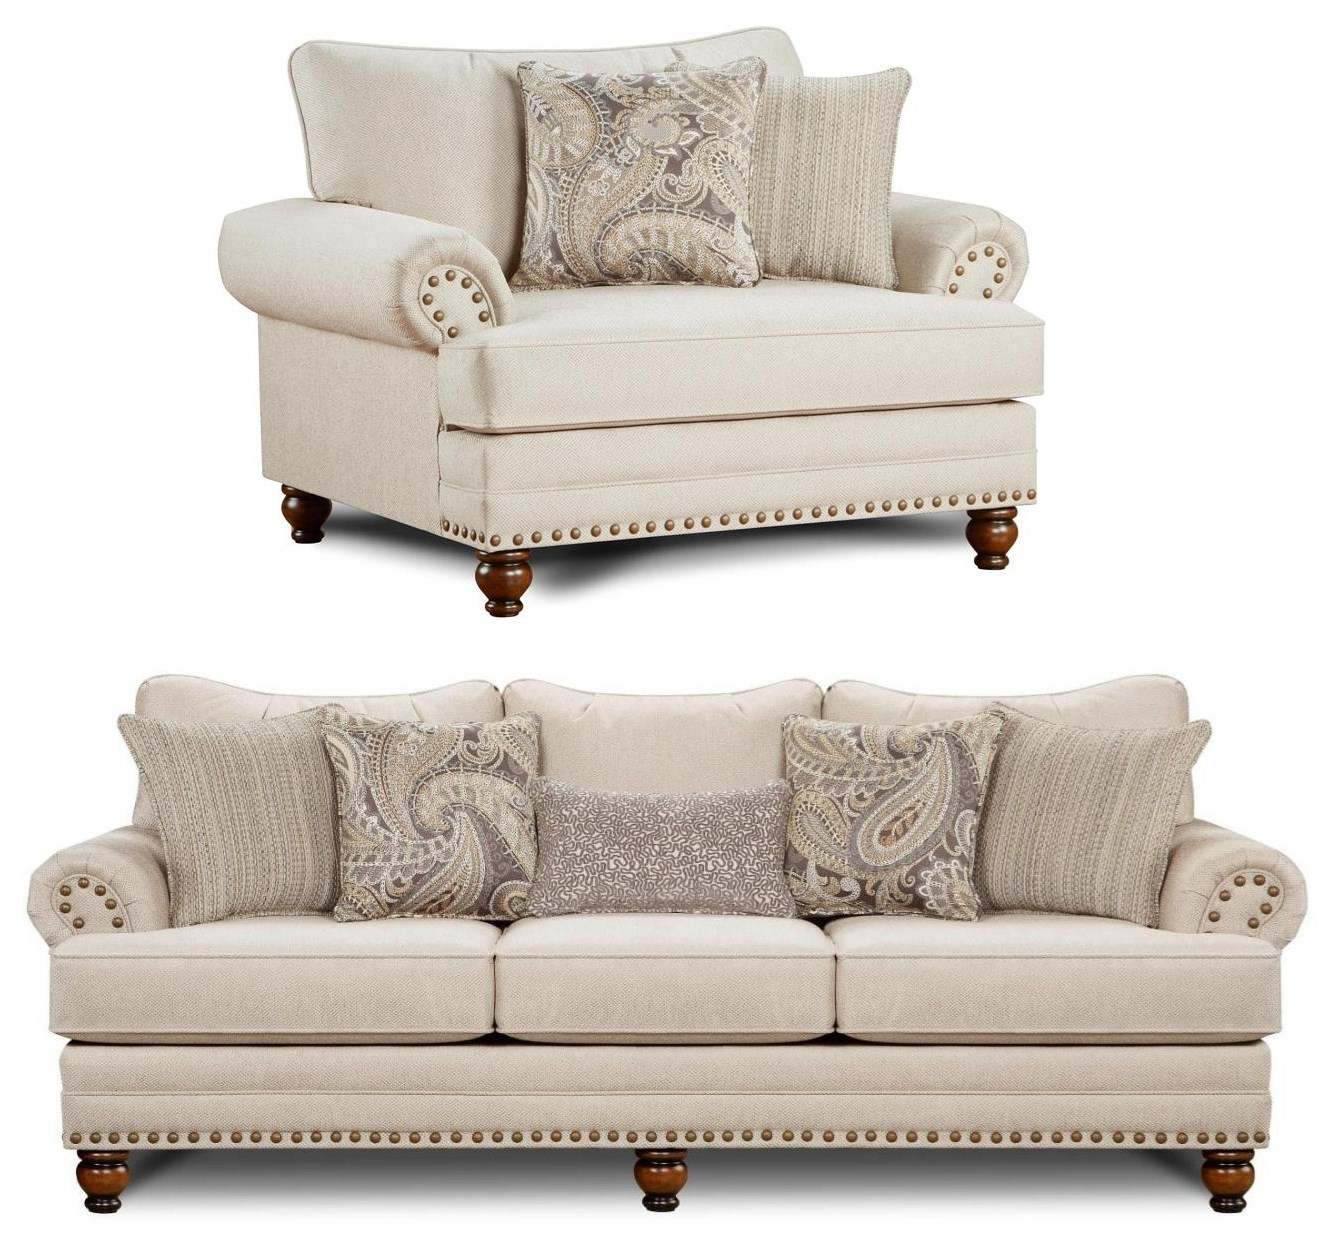 Bambi 2PC Sofa & Chair Set at Rotmans